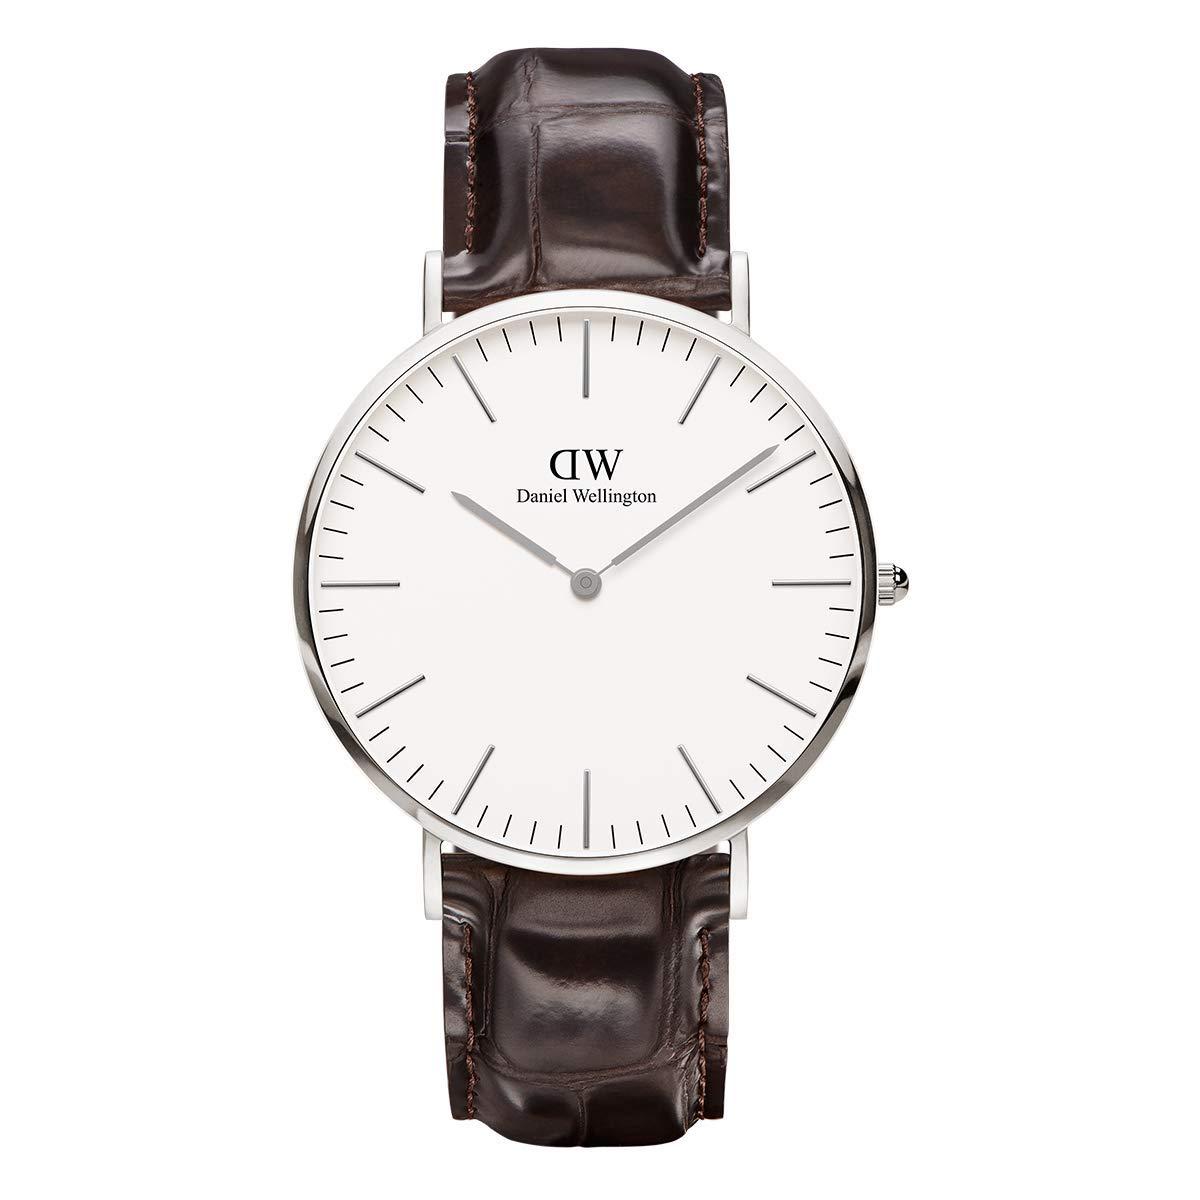 Daniel Wellington Trenduhren  Classic York, Dunkelbraun/Roségold Uhr, 40mm, Leder, für Herren